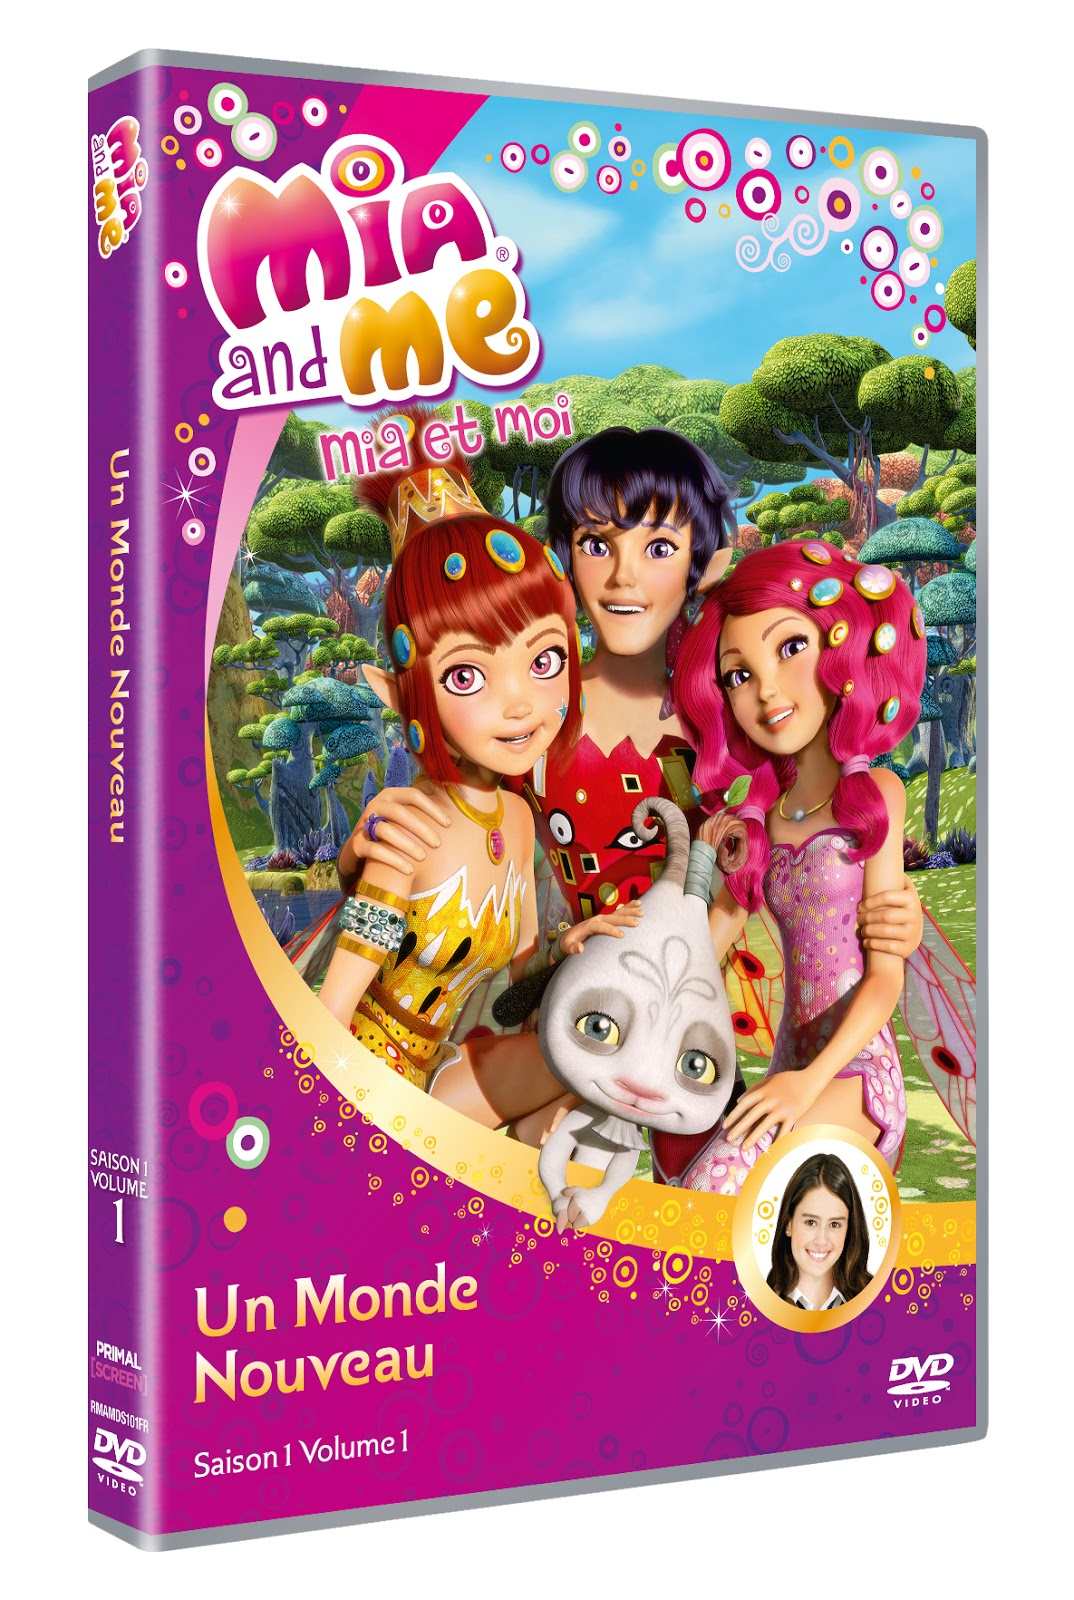 Decouvertesenfants mia and me enfin en dvd concours - Mia et moi saison 2 ...